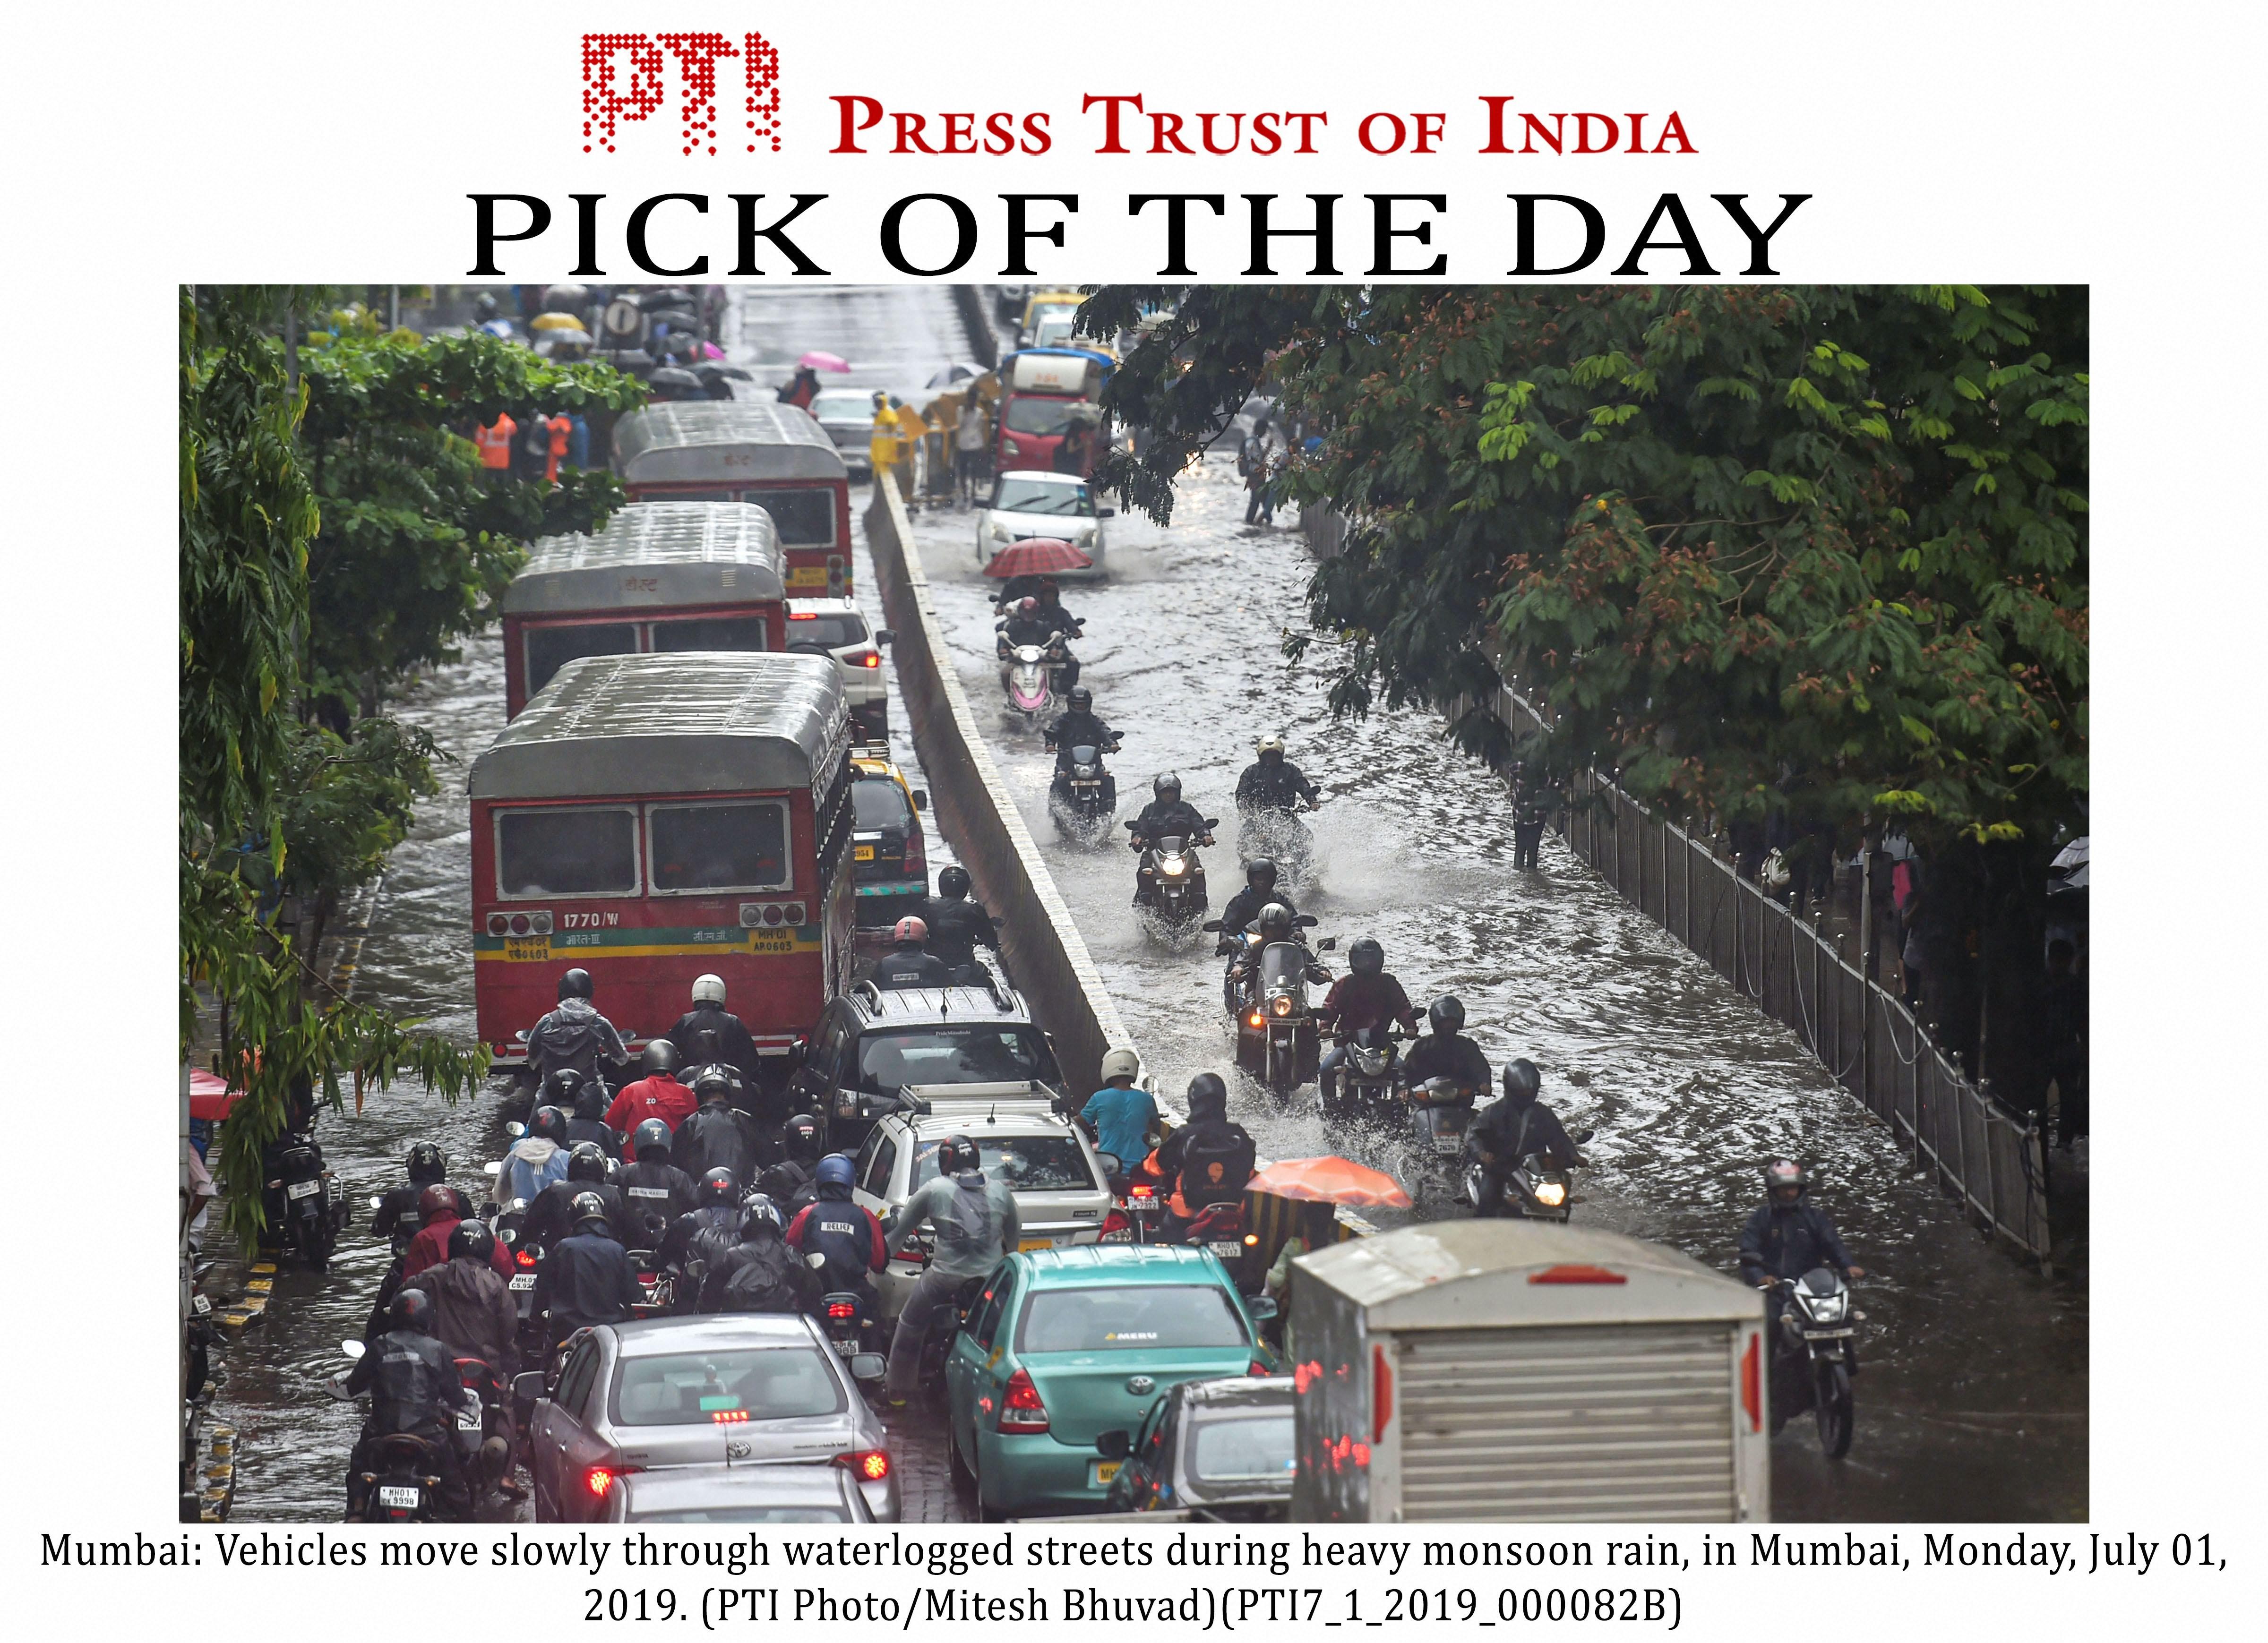 Vehicles stuck on waterlogged streets in Mumbai on July 1.